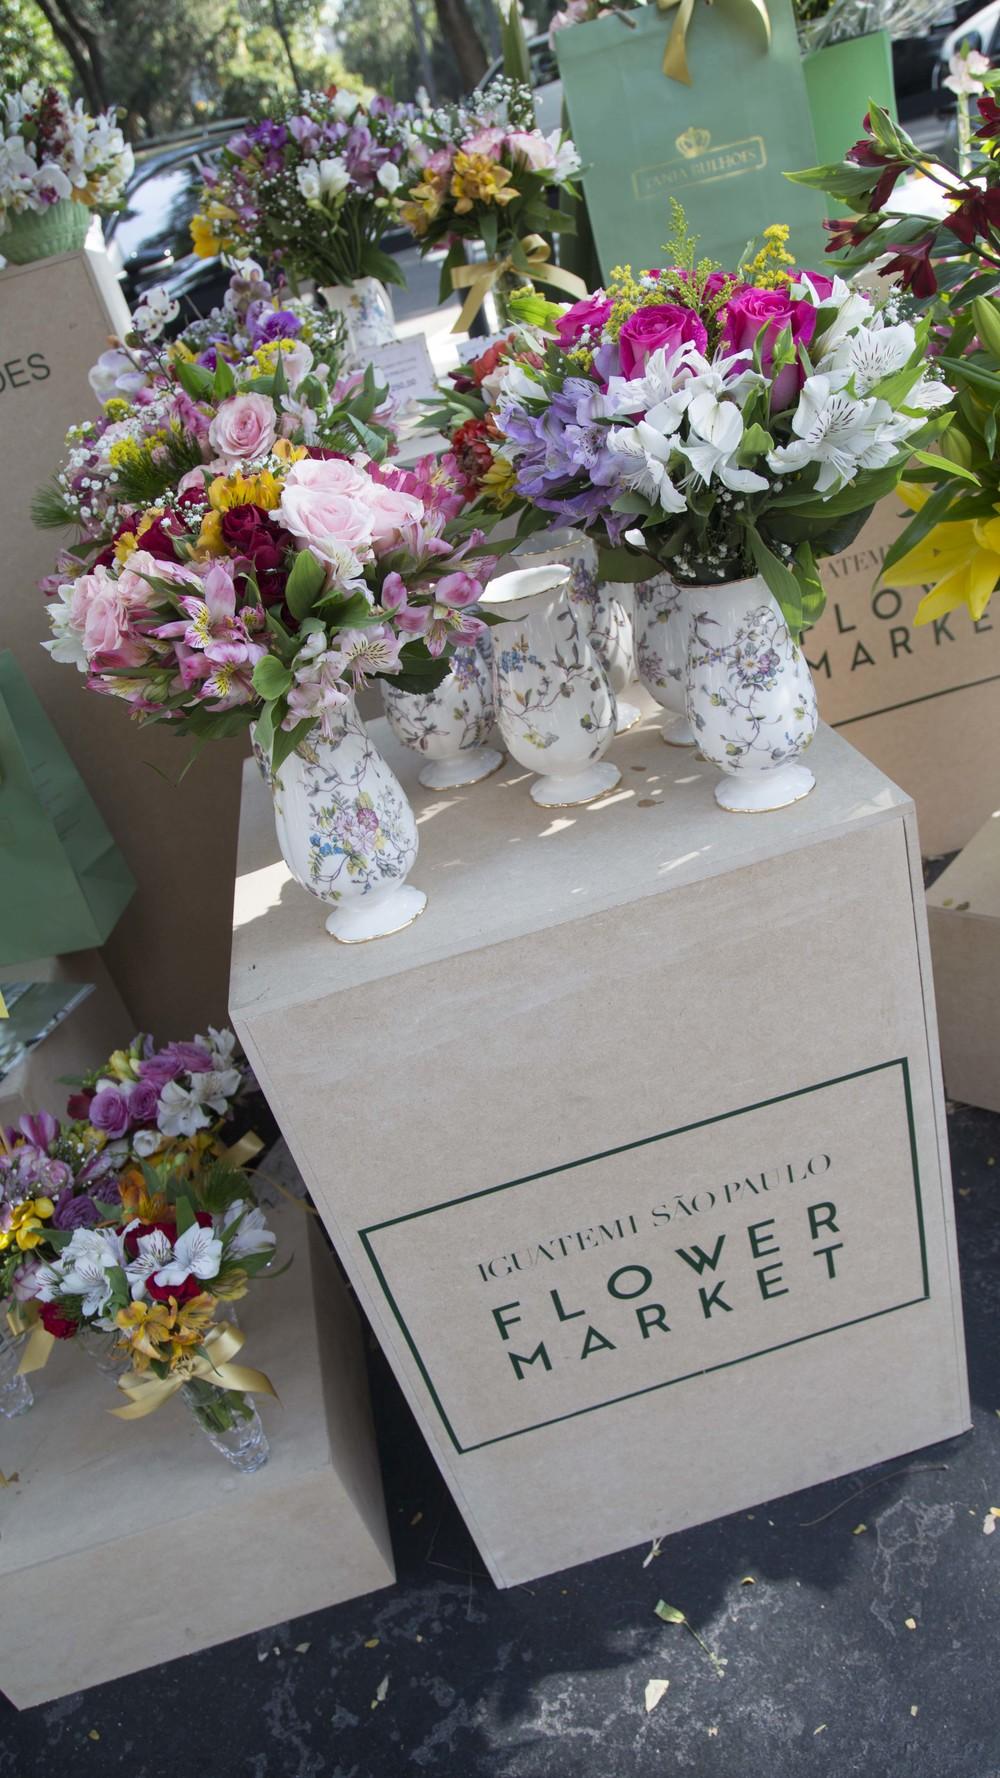 Iguatemi São Paulo_Flower Market_12.jpg